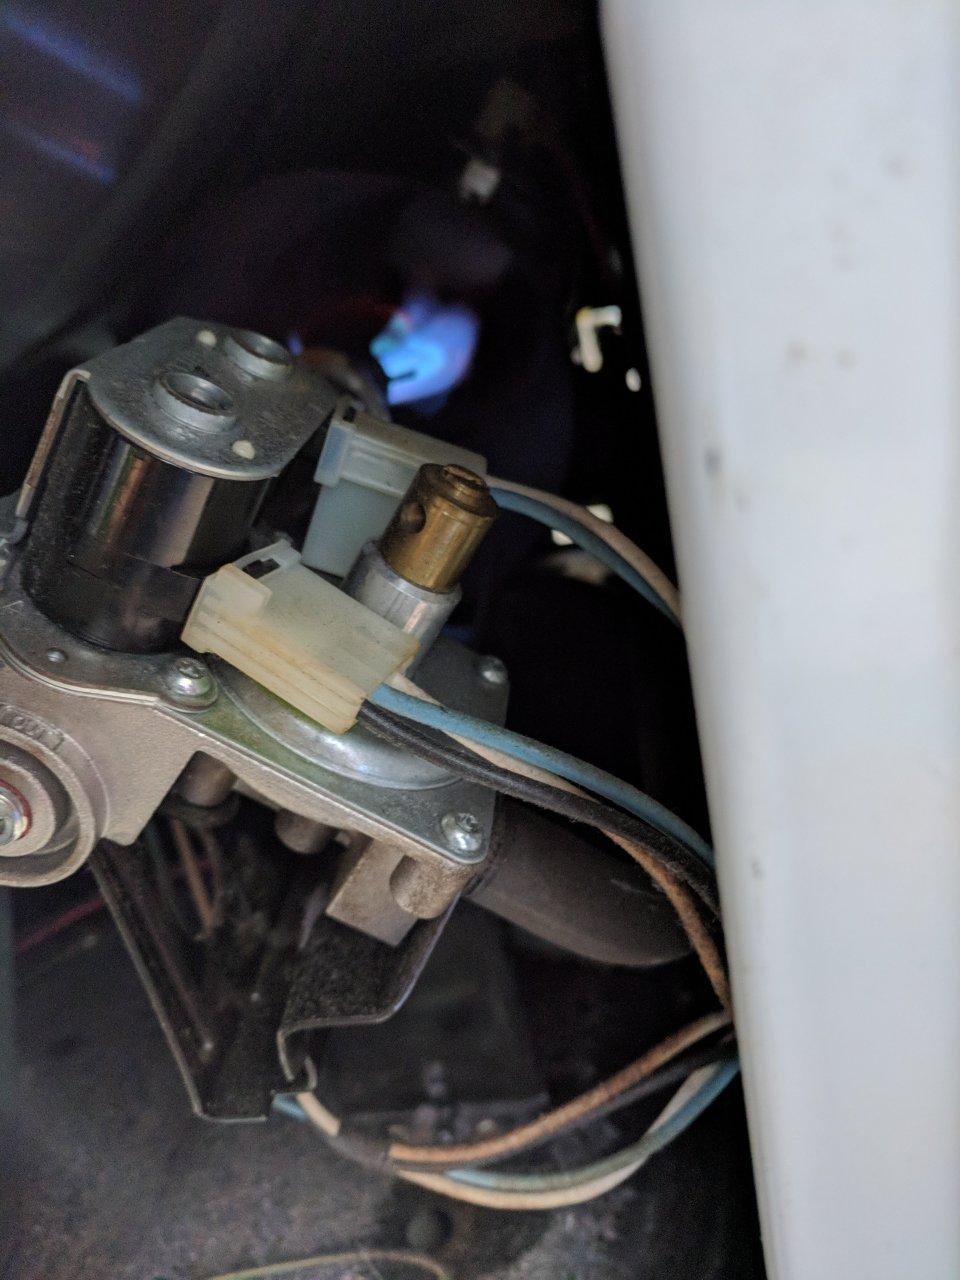 Kenmore Elite He3 Gas Dryer Not Heating Properly